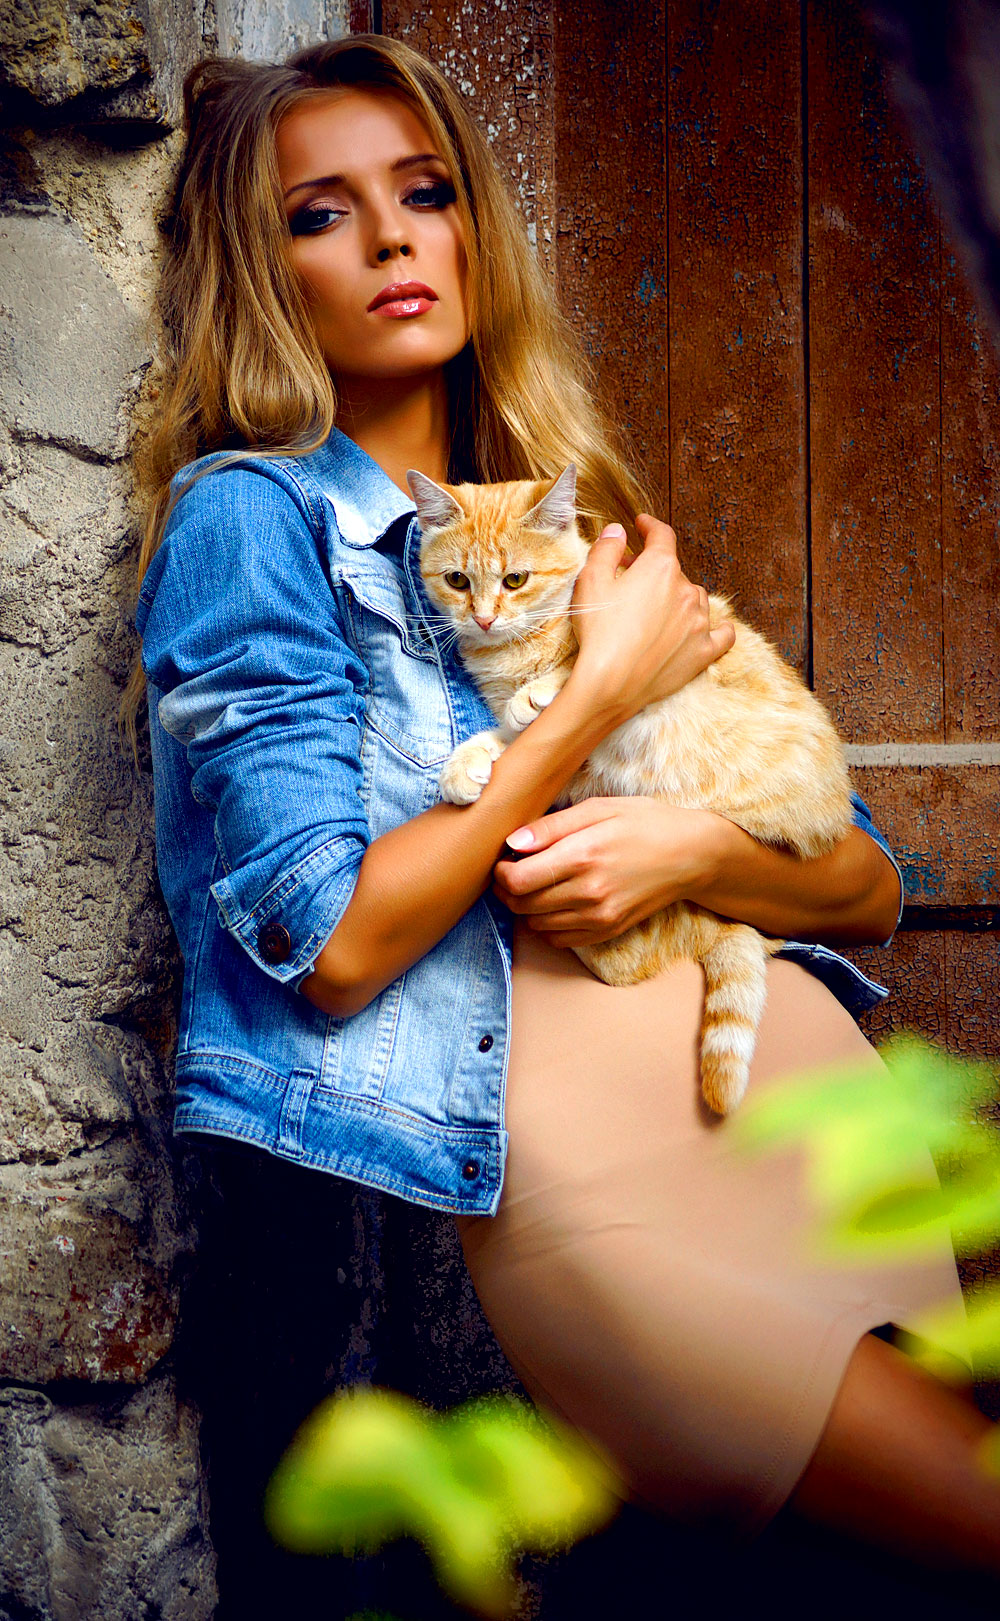 Katzen als Frauenmagnet